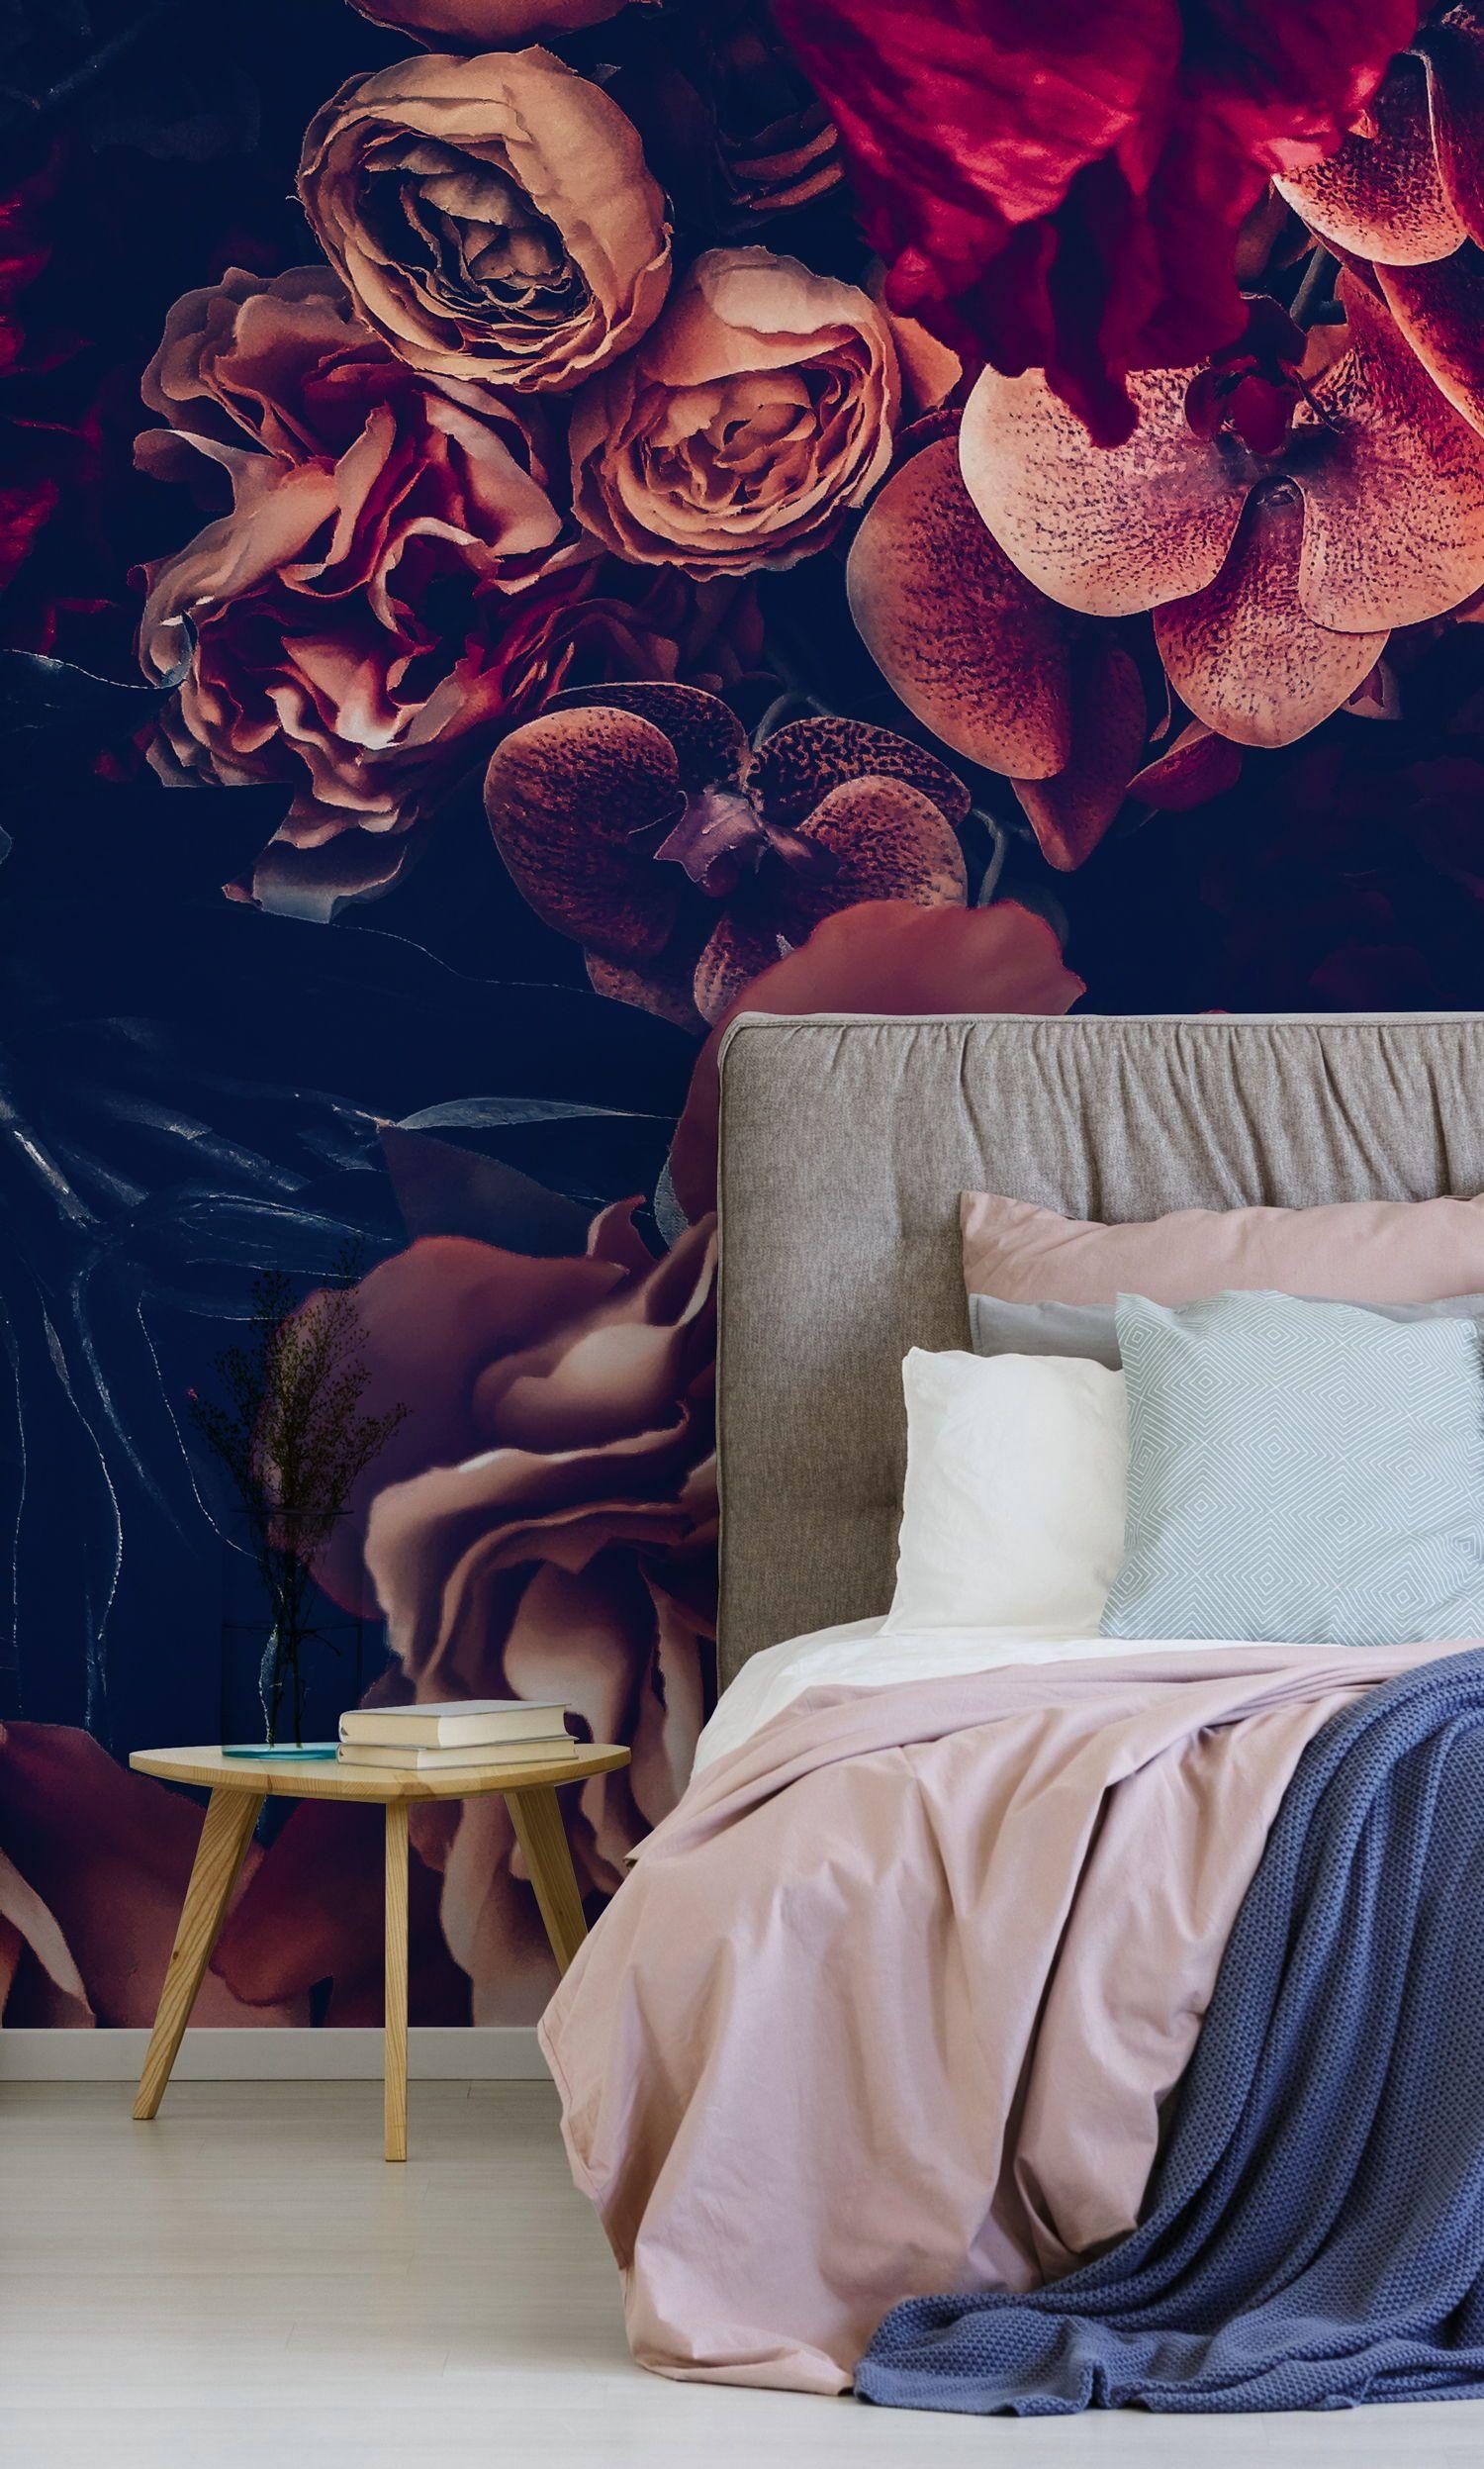 Dark Vintage Floral Wallpaper In The Bedroom Vintage Floral Wallpapers Master Bedroom Wallpaper Floral Wallpaper Bedroom